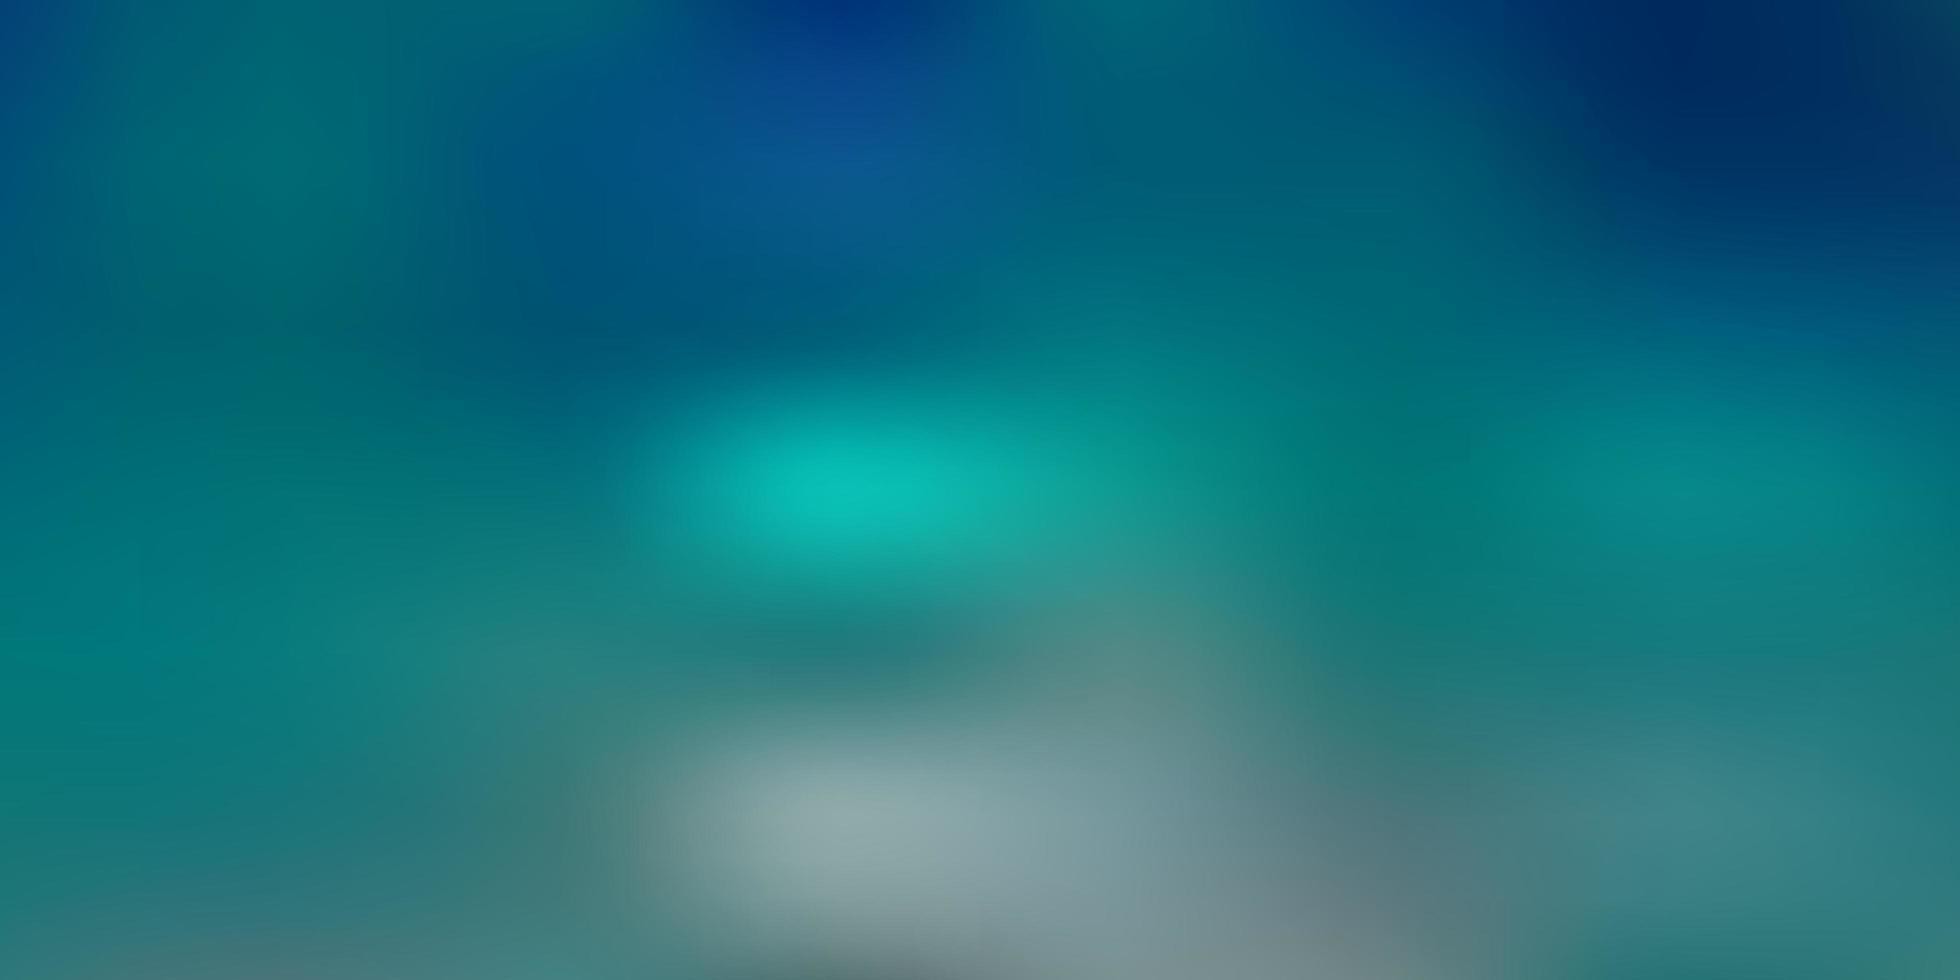 texture floue de vecteur bleu clair, vert.